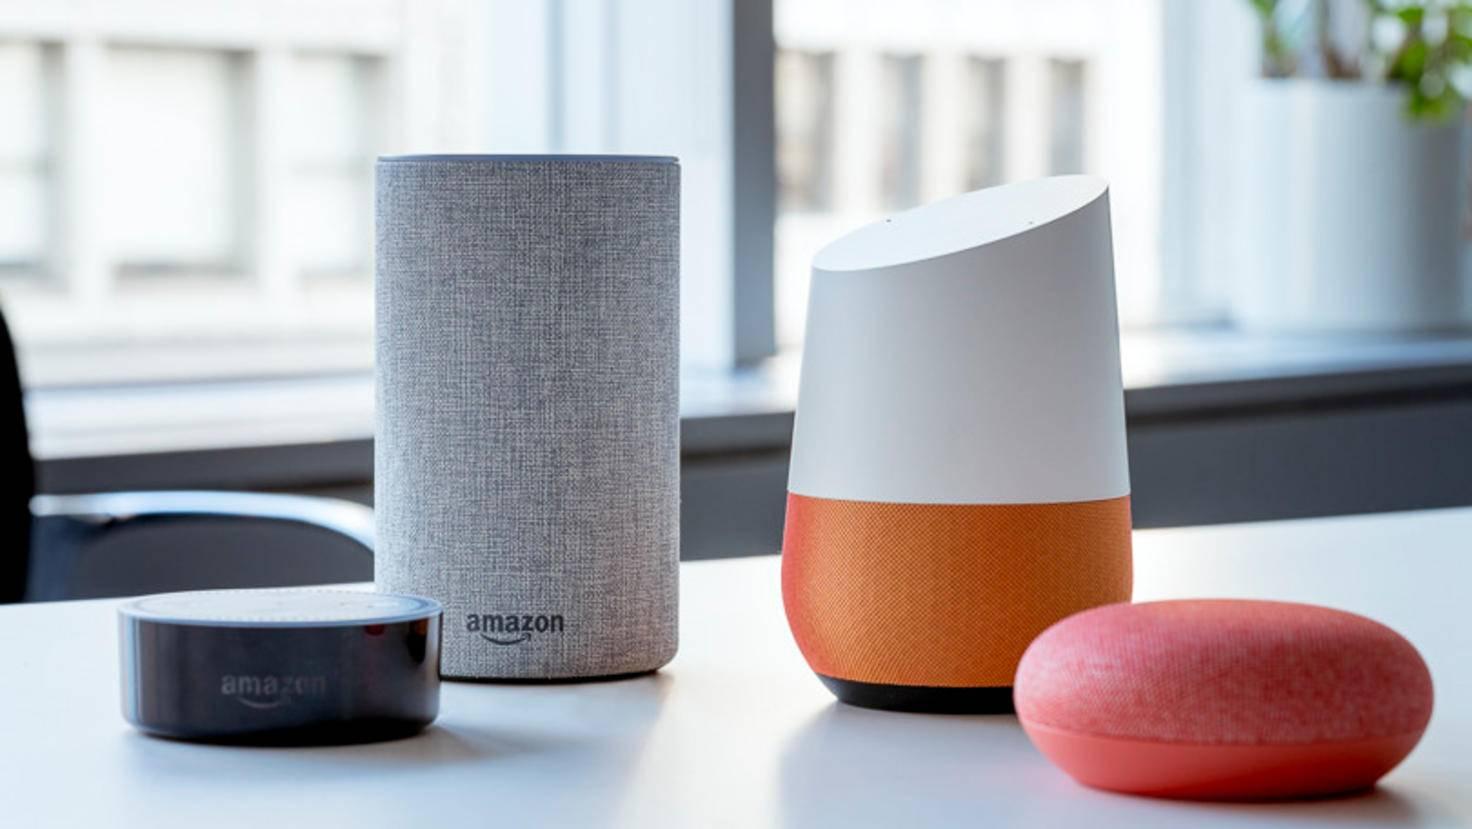 amazon-echo-vs-google-home